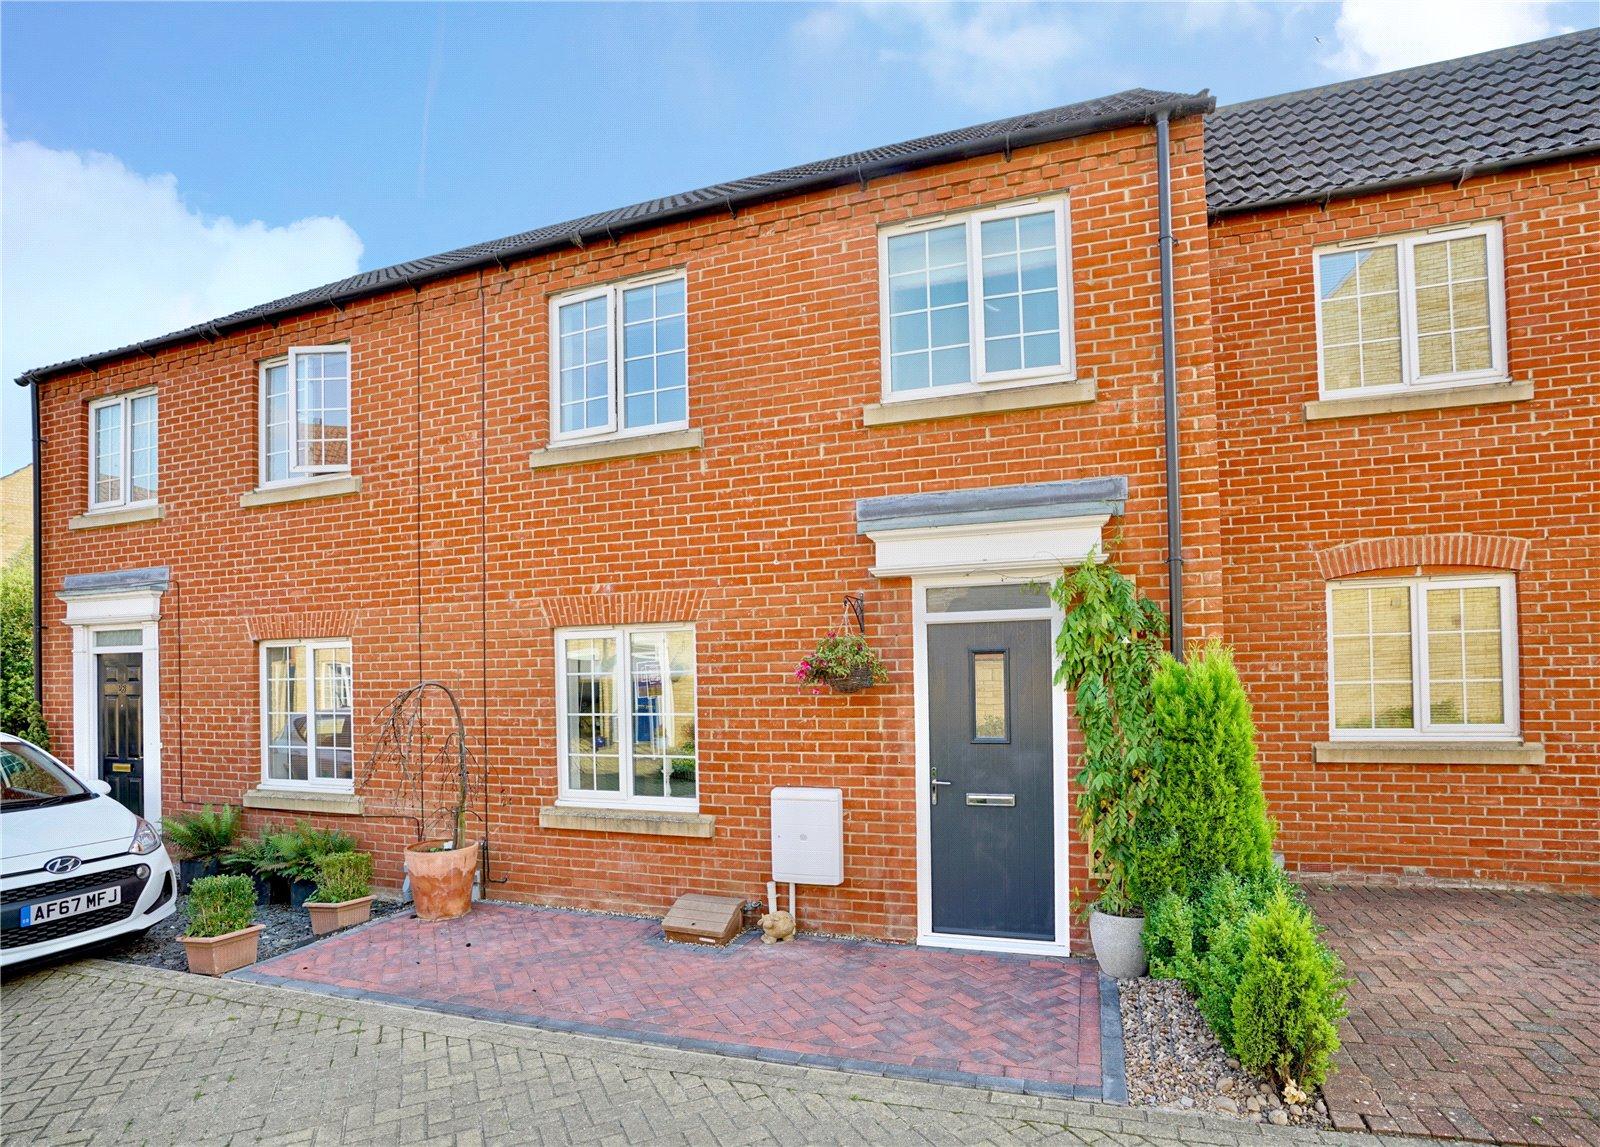 3 bed house for sale in Eynesbury, Malden Way, PE19 2GF, PE19